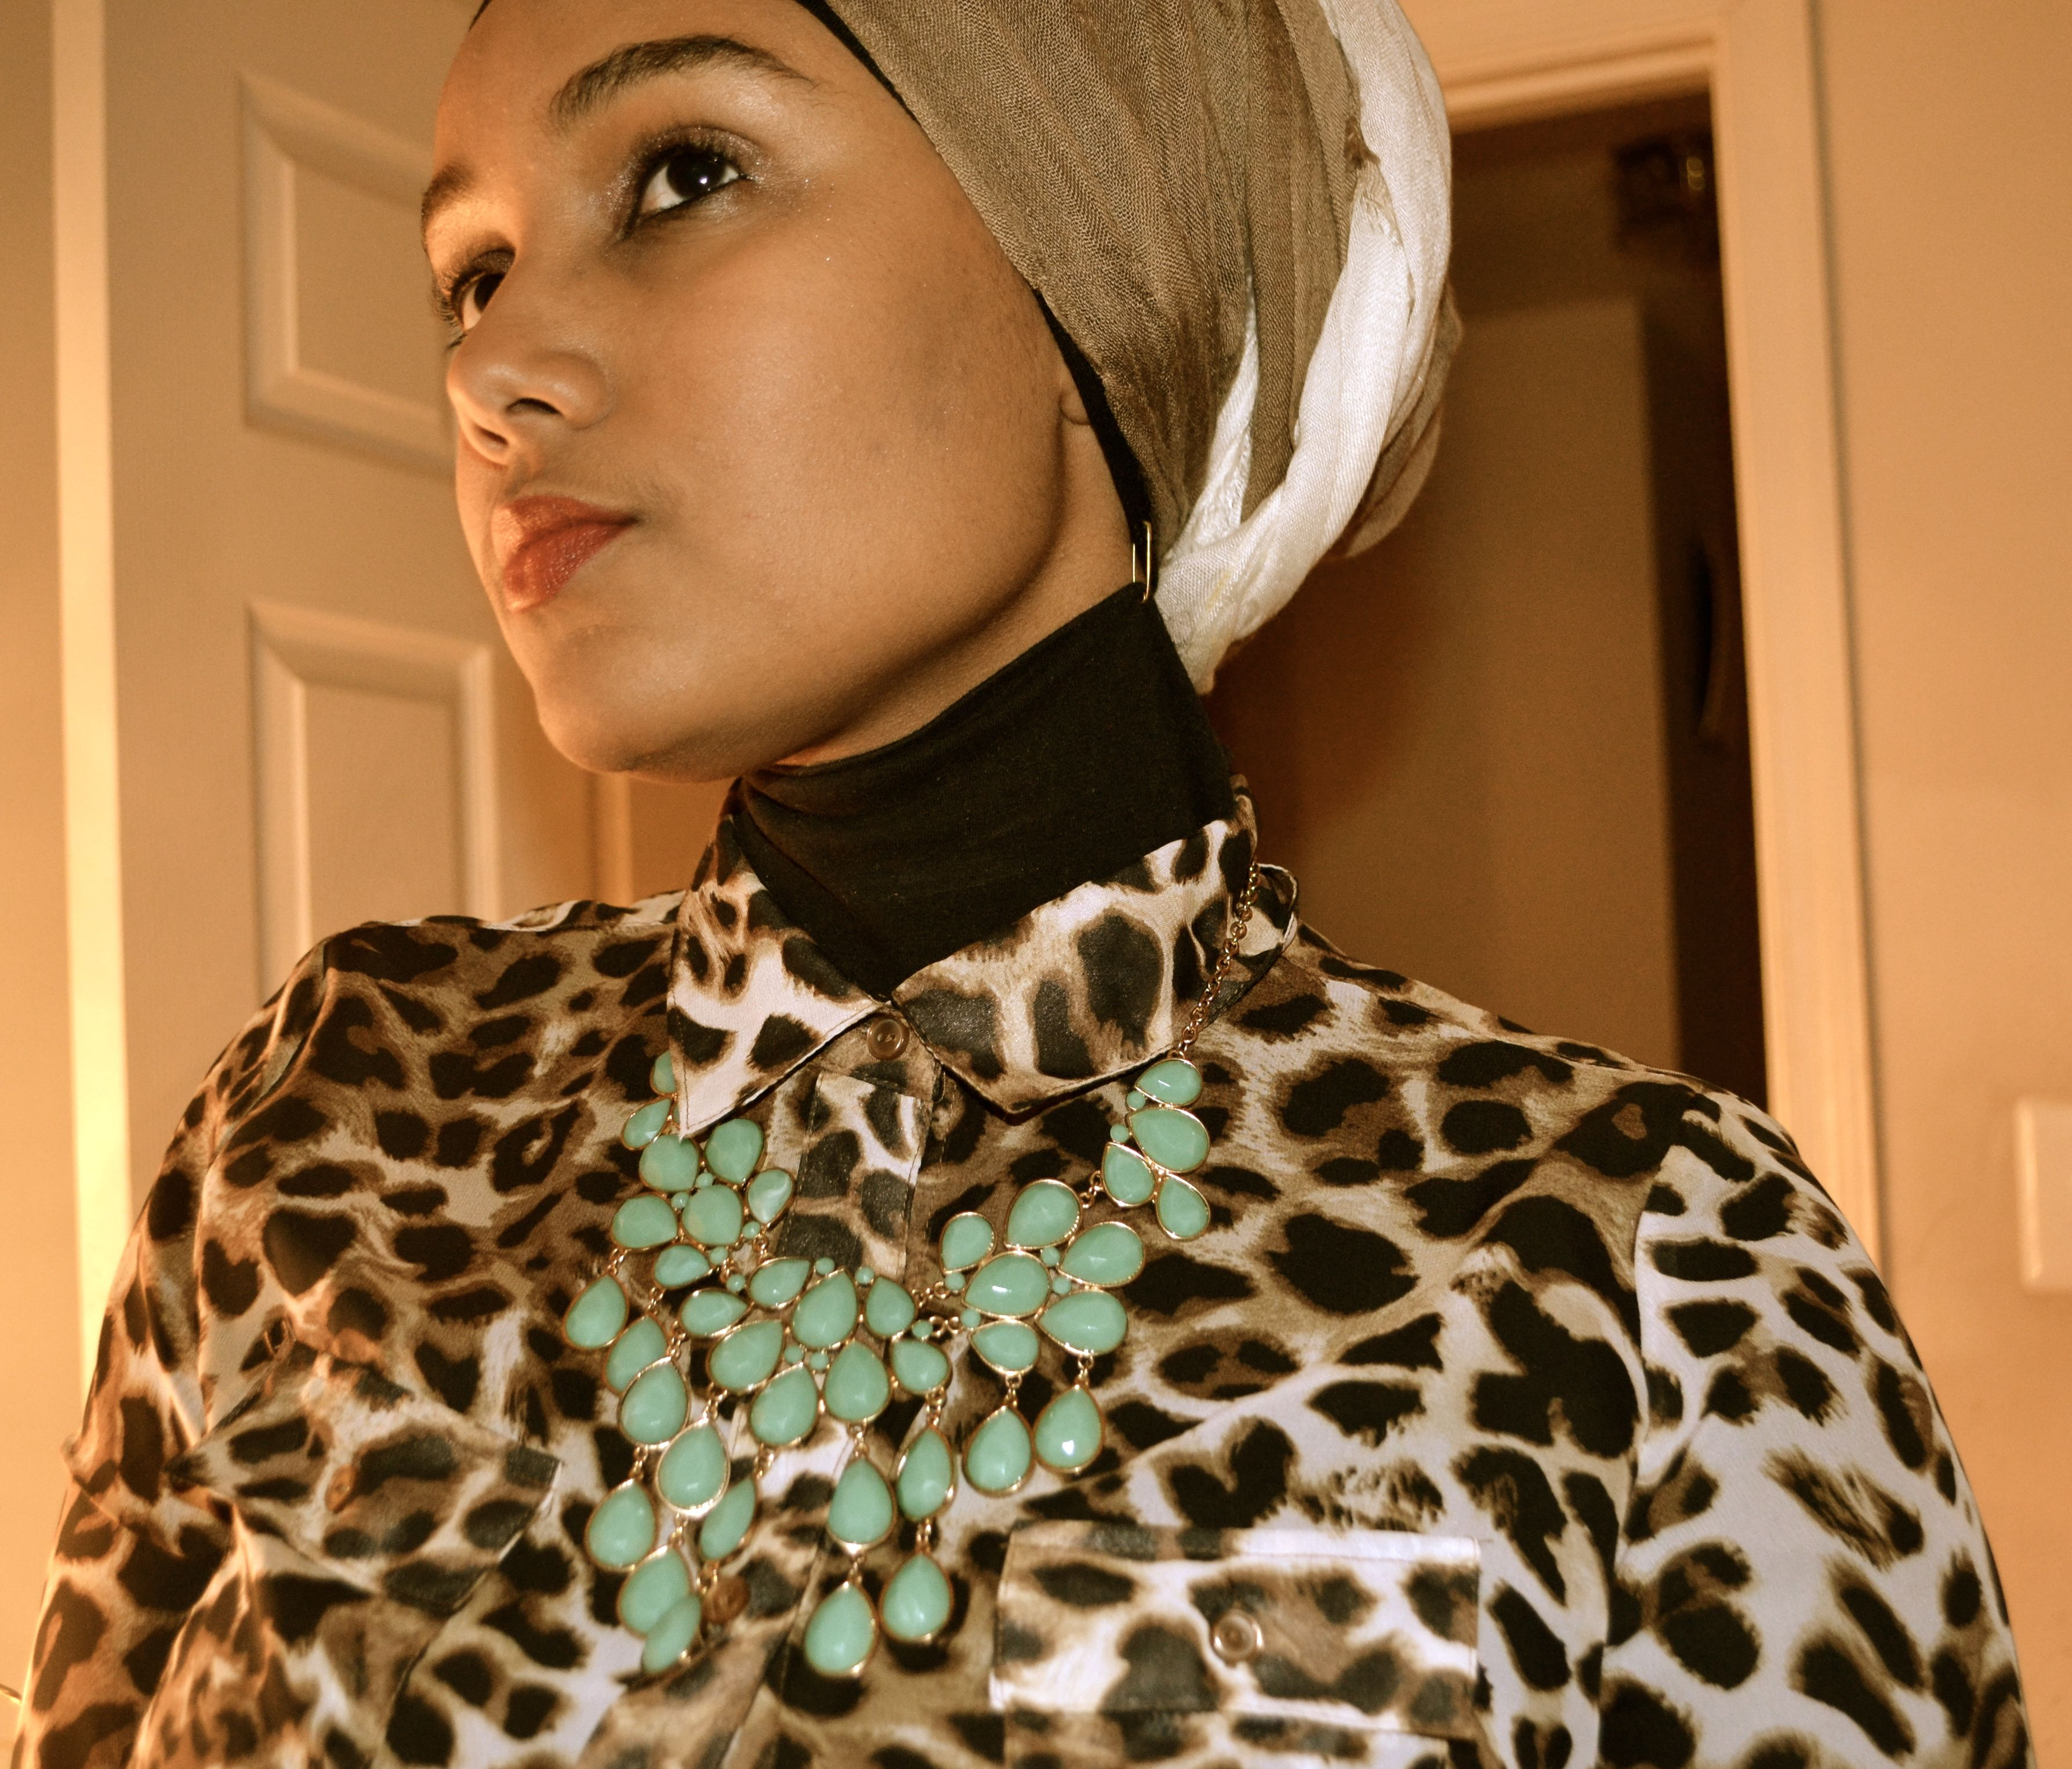 hijab fashion outfits tumblr - Google Search   Fashion ...